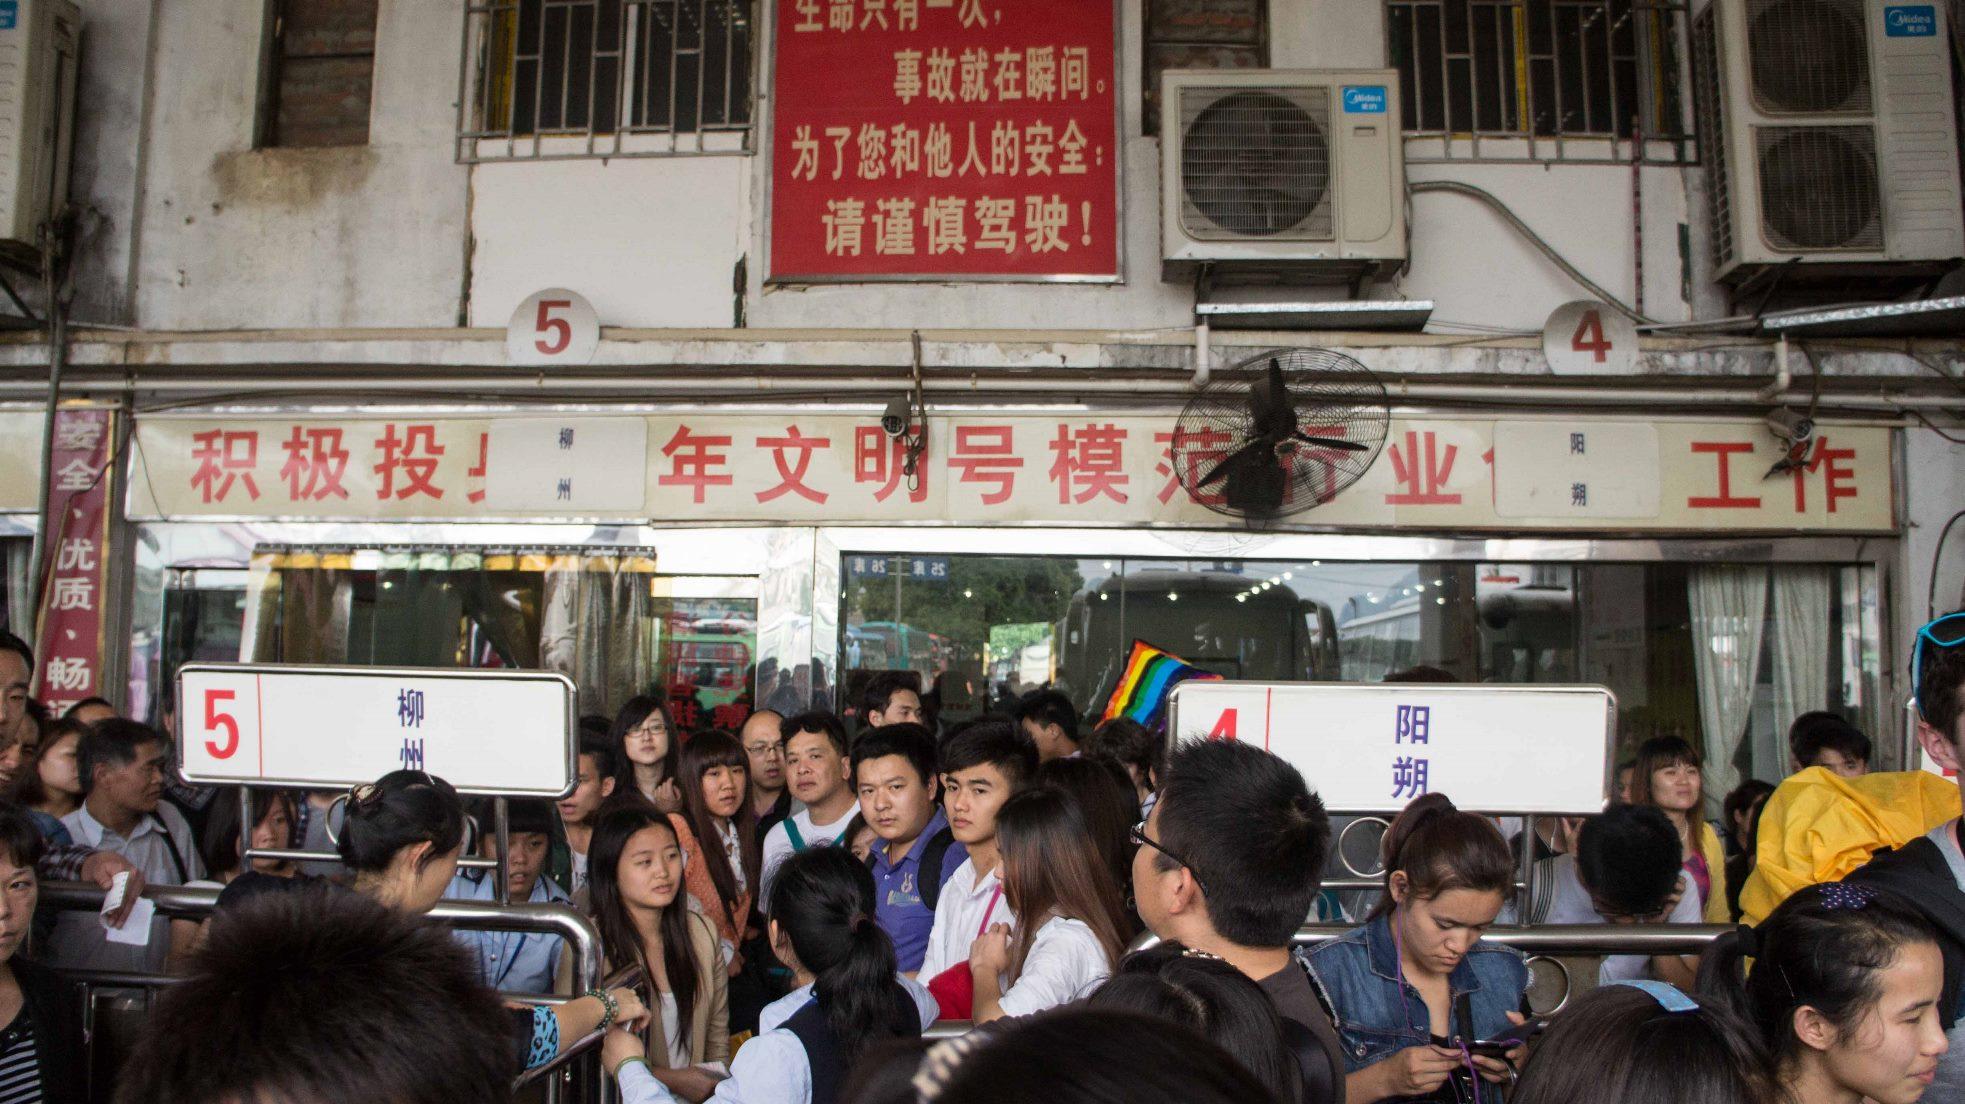 dworzec w Guilin